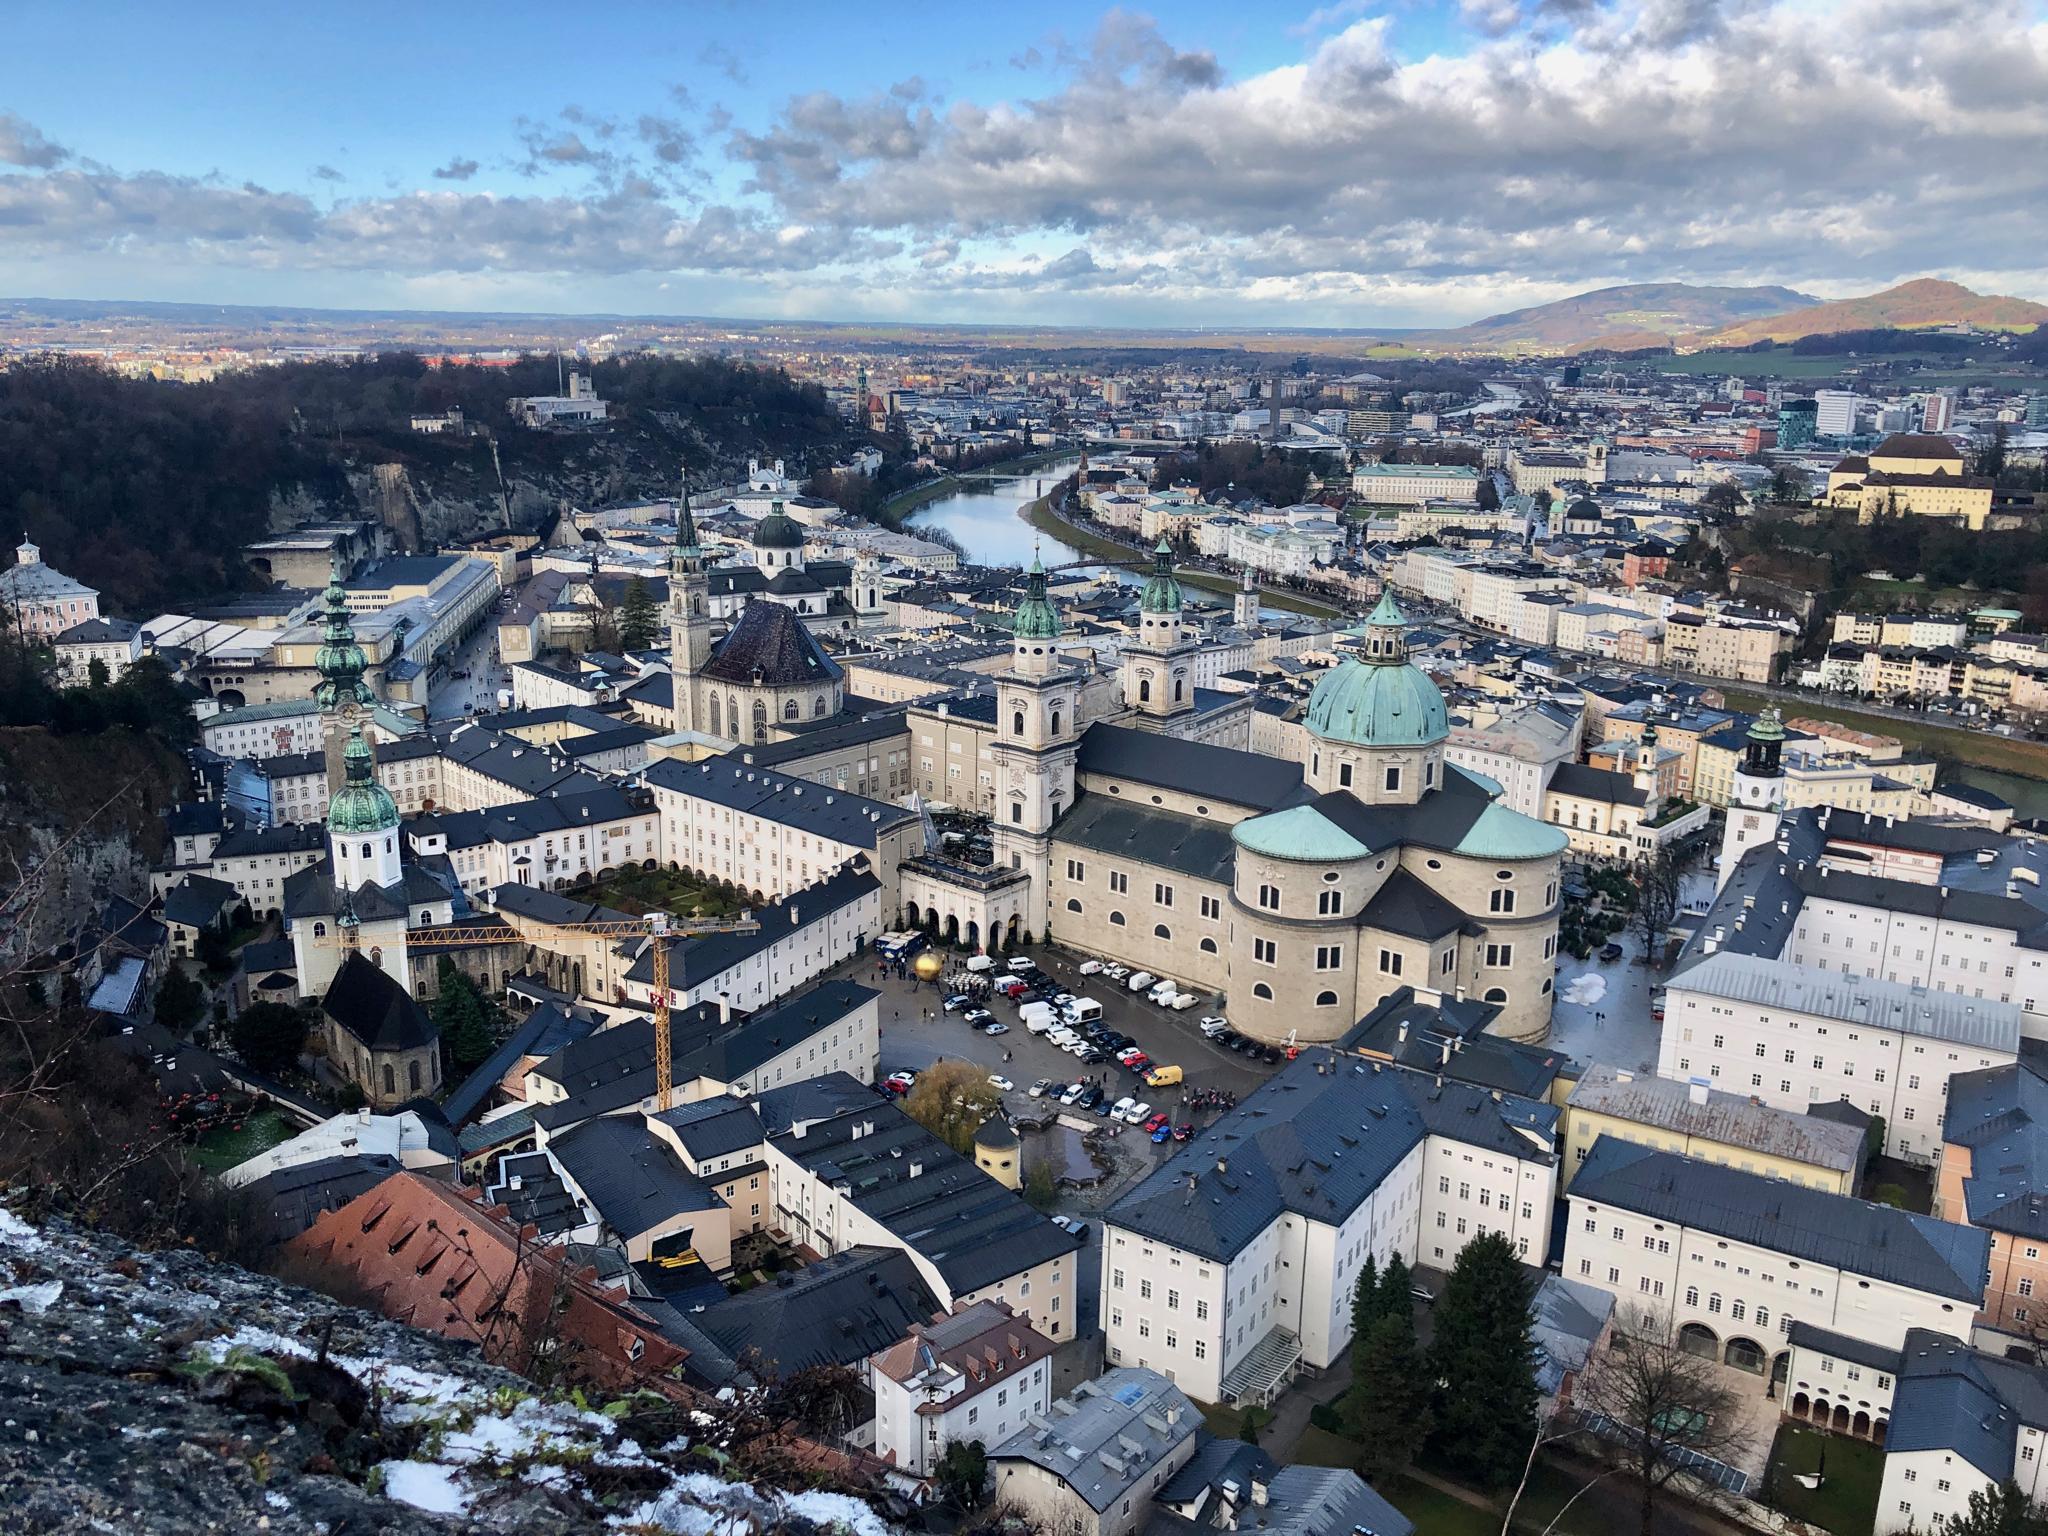 Salzburg Überblick